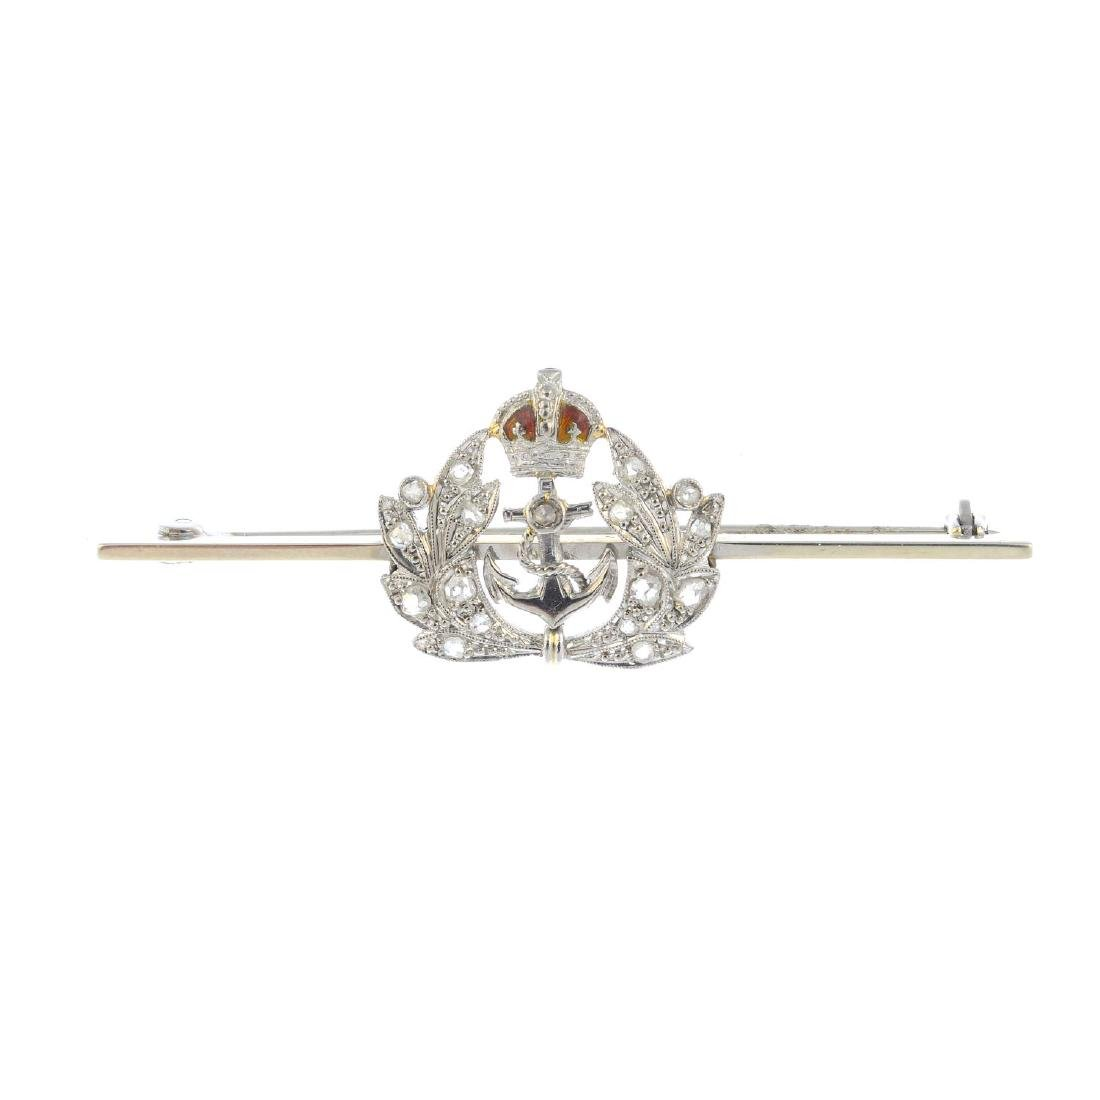 A mid 20th century diamond brooch. Designed as an